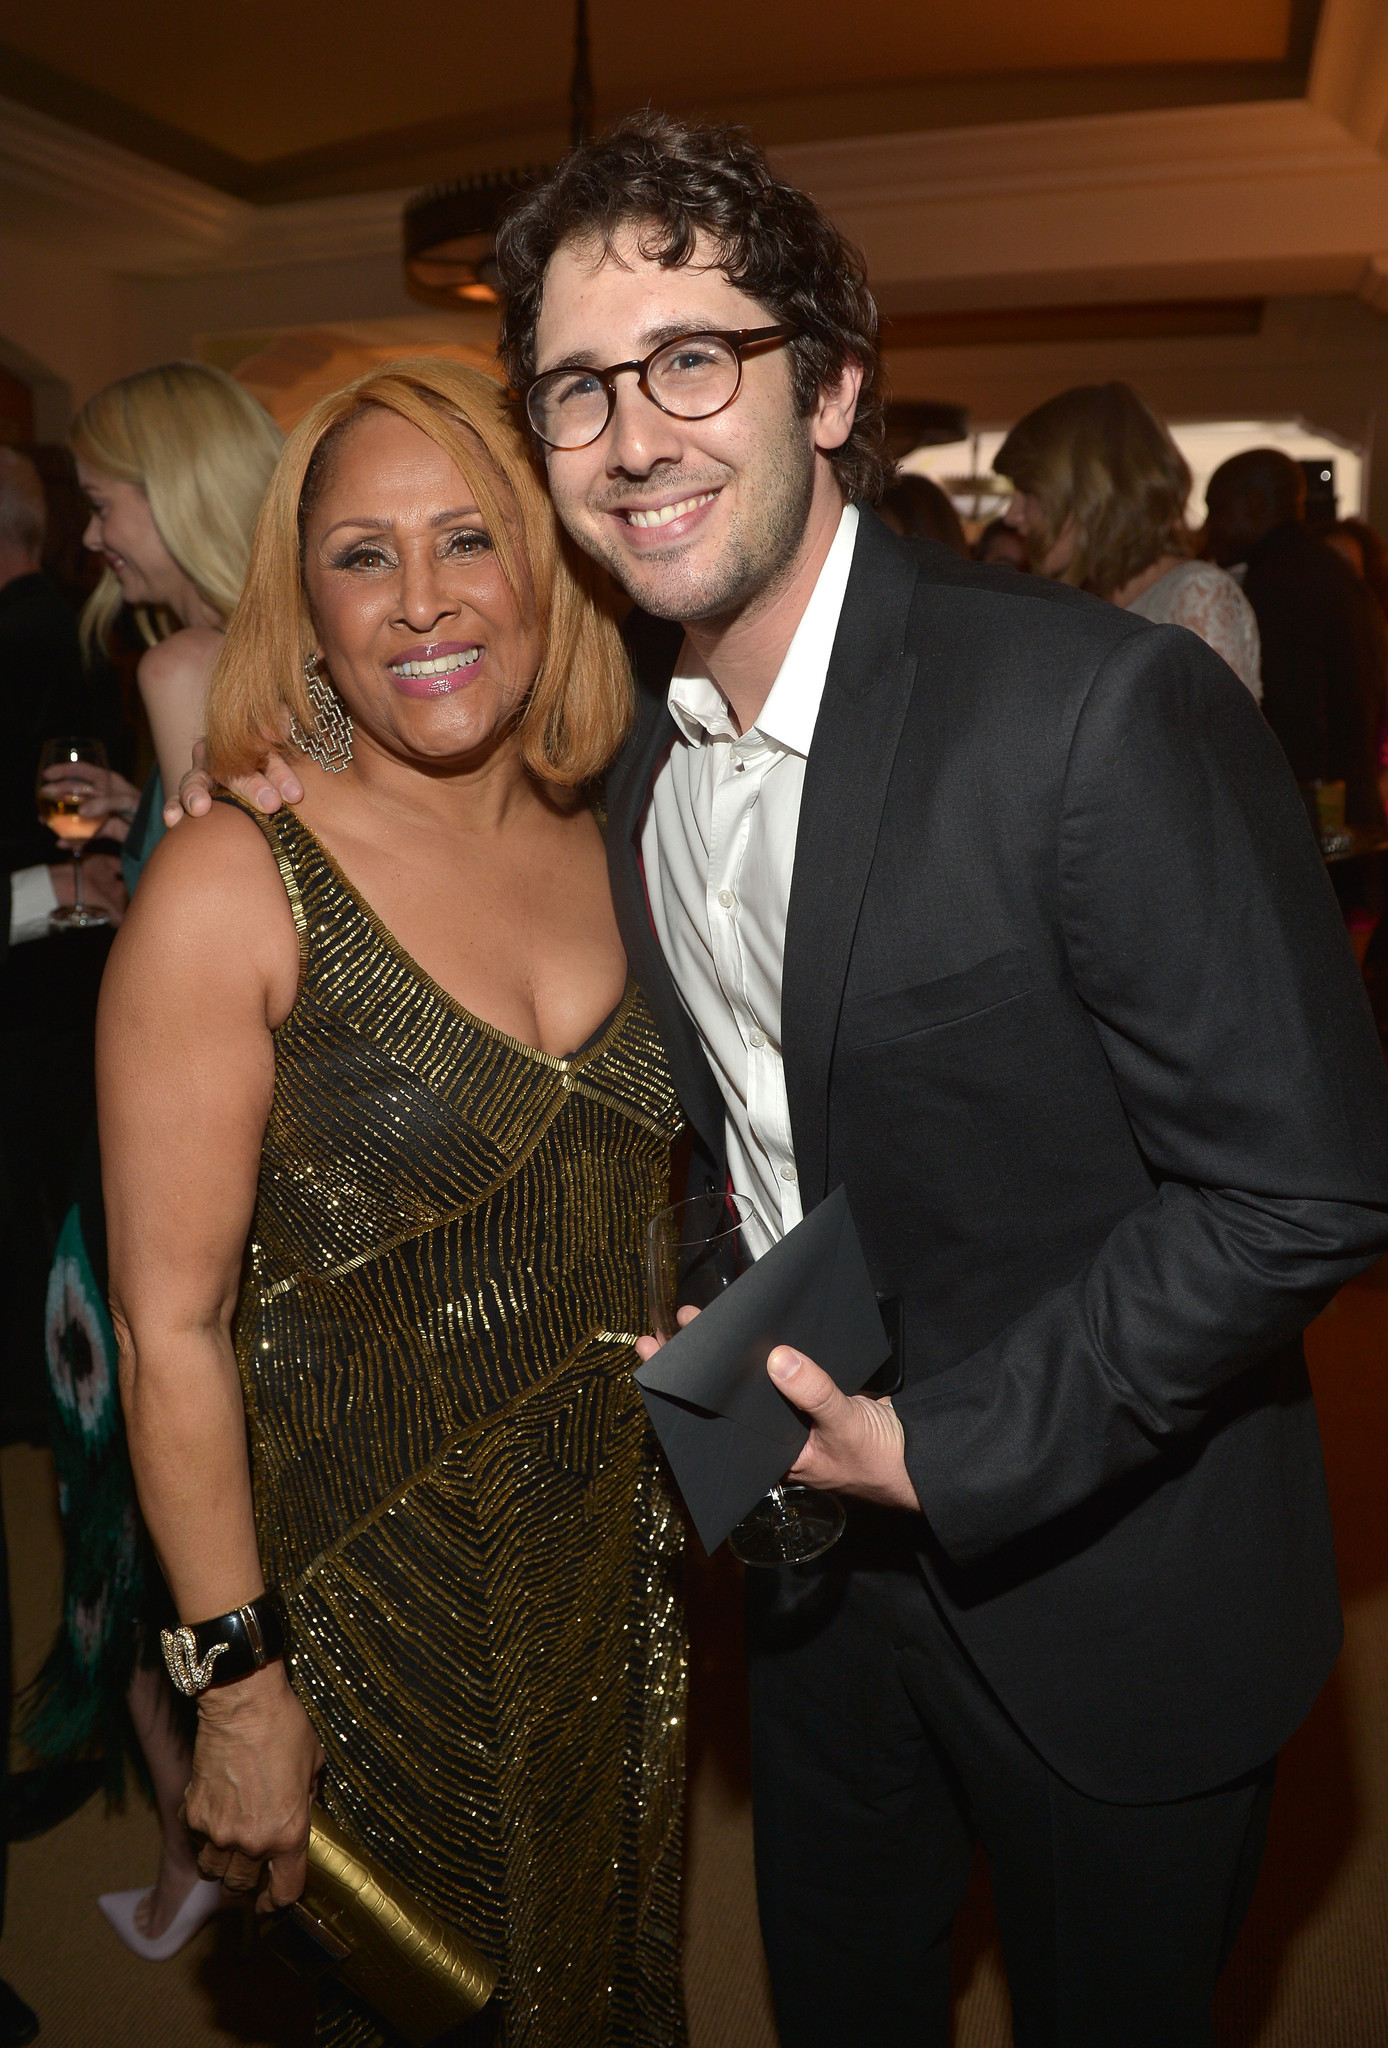 2014 The Weinstein Company's Academy Award party photos: Darlene Love